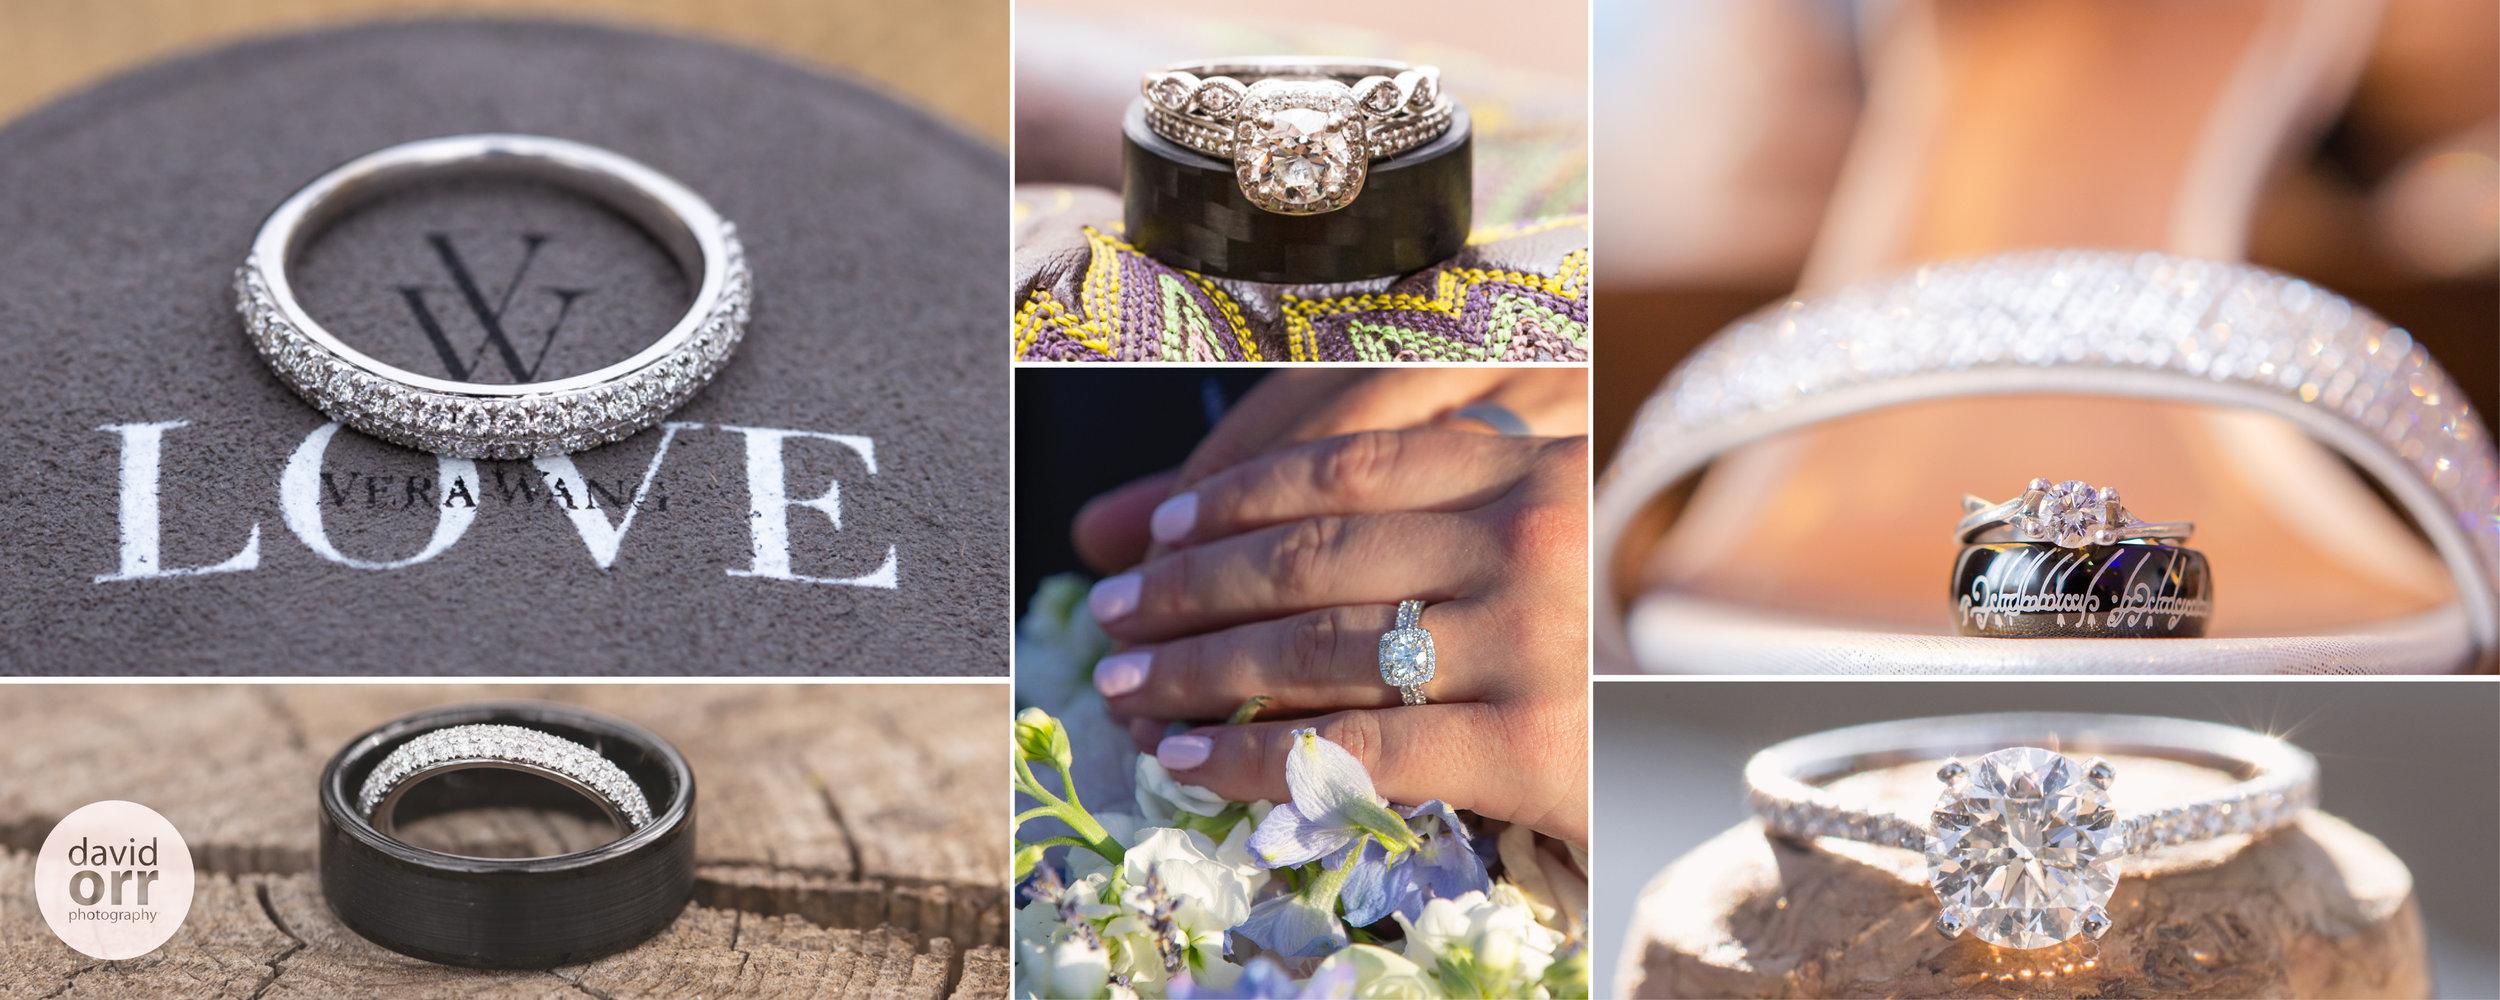 DavidOrrPhotography_Engagement-Wedding-Ring-Trends.jpg